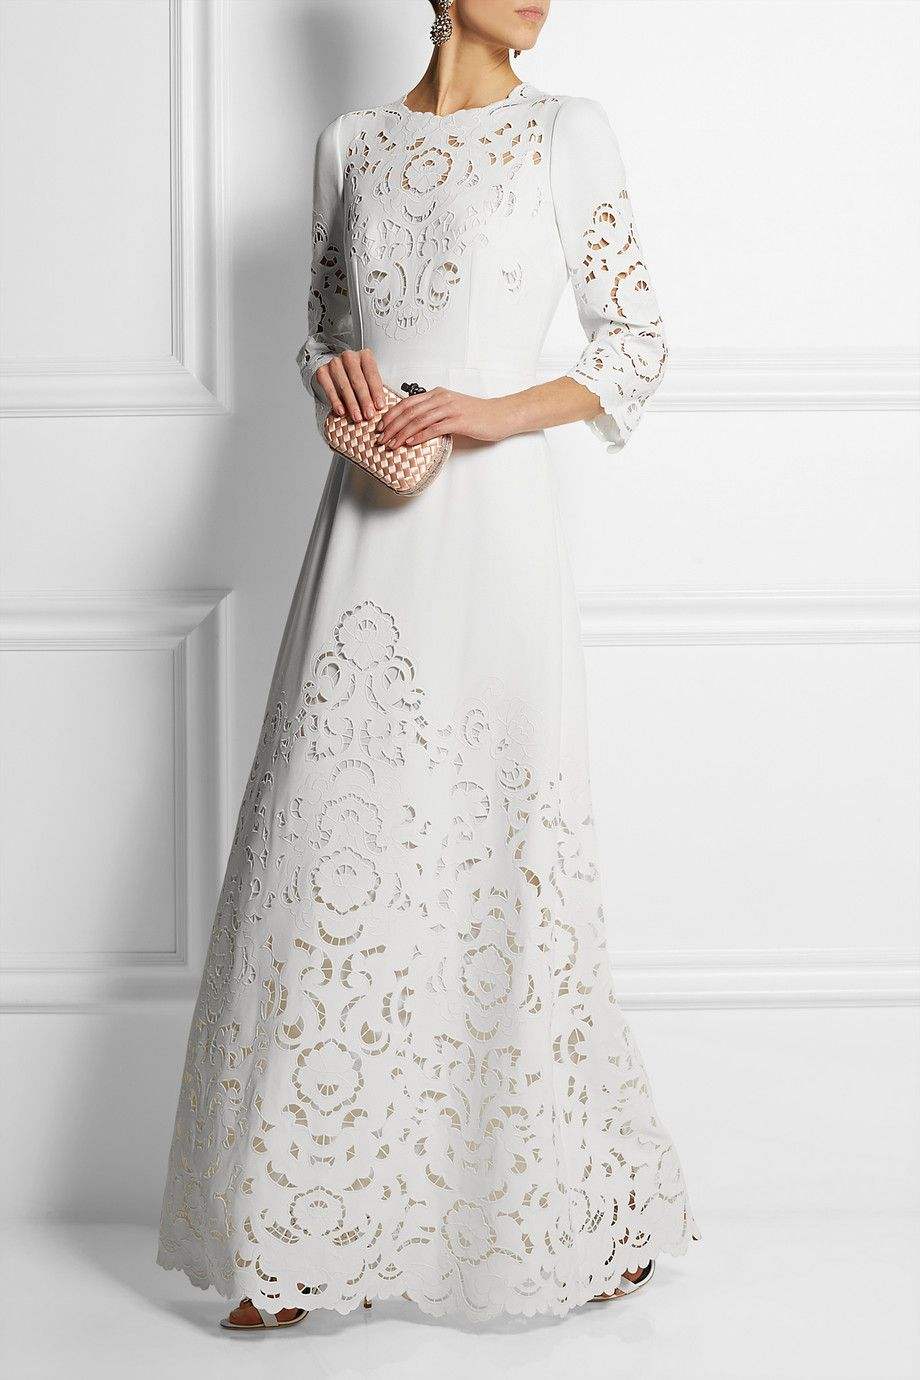 de GabbanaFilet cr en Dolce robe TzqH0